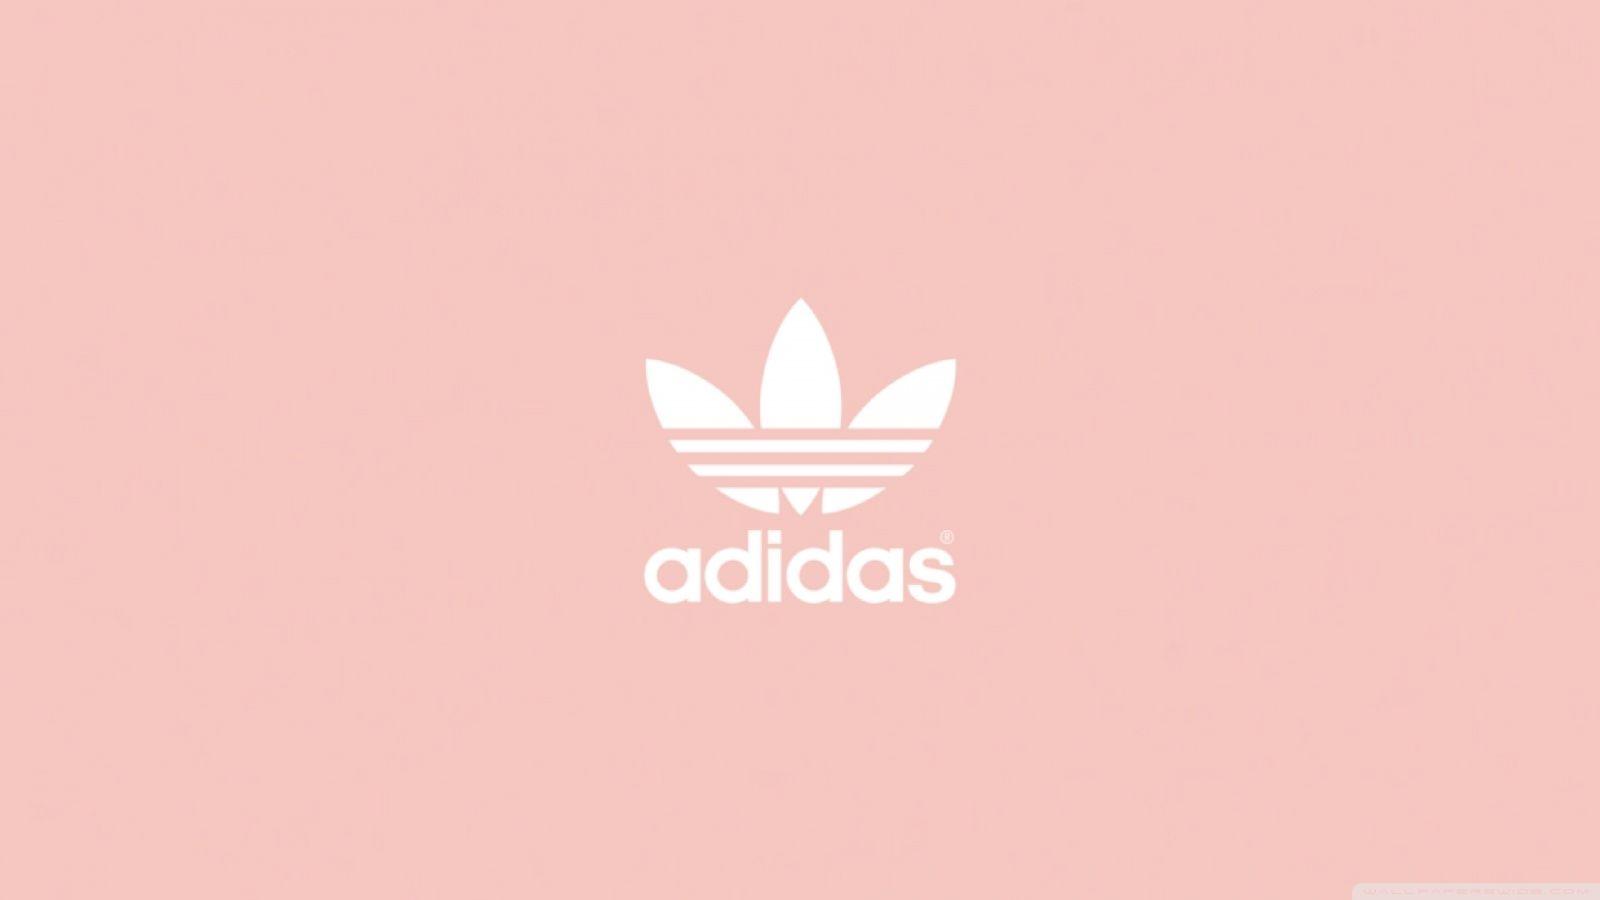 Pink Adidas Logo Wallpapers   Top Pink Adidas Logo 1600x900